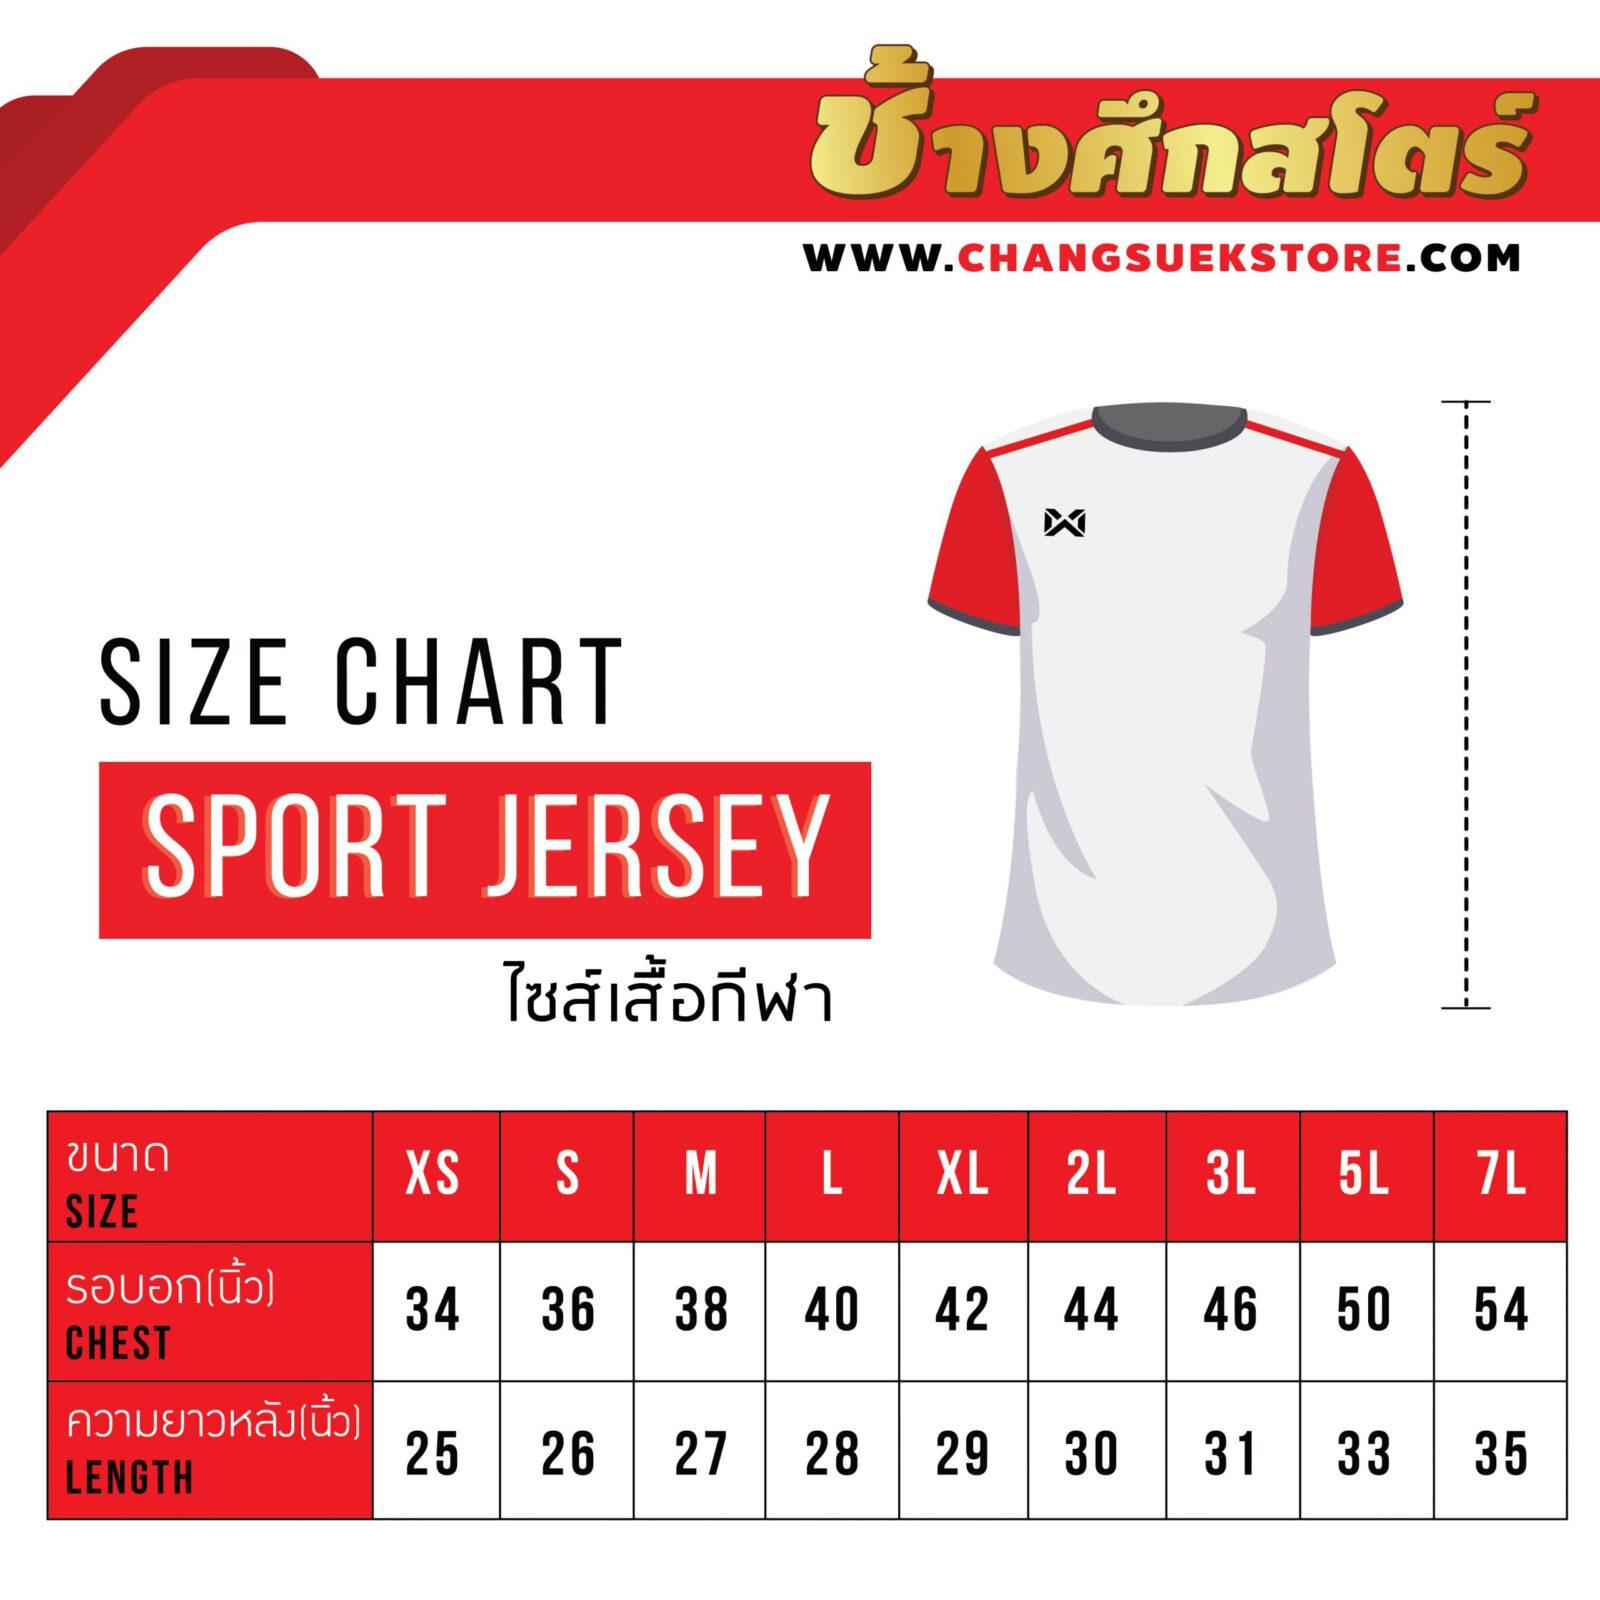 WARRIX เสื้อฟุตบอล รุ่น LONZO สีแดง-ส้ม WA-1558-RO